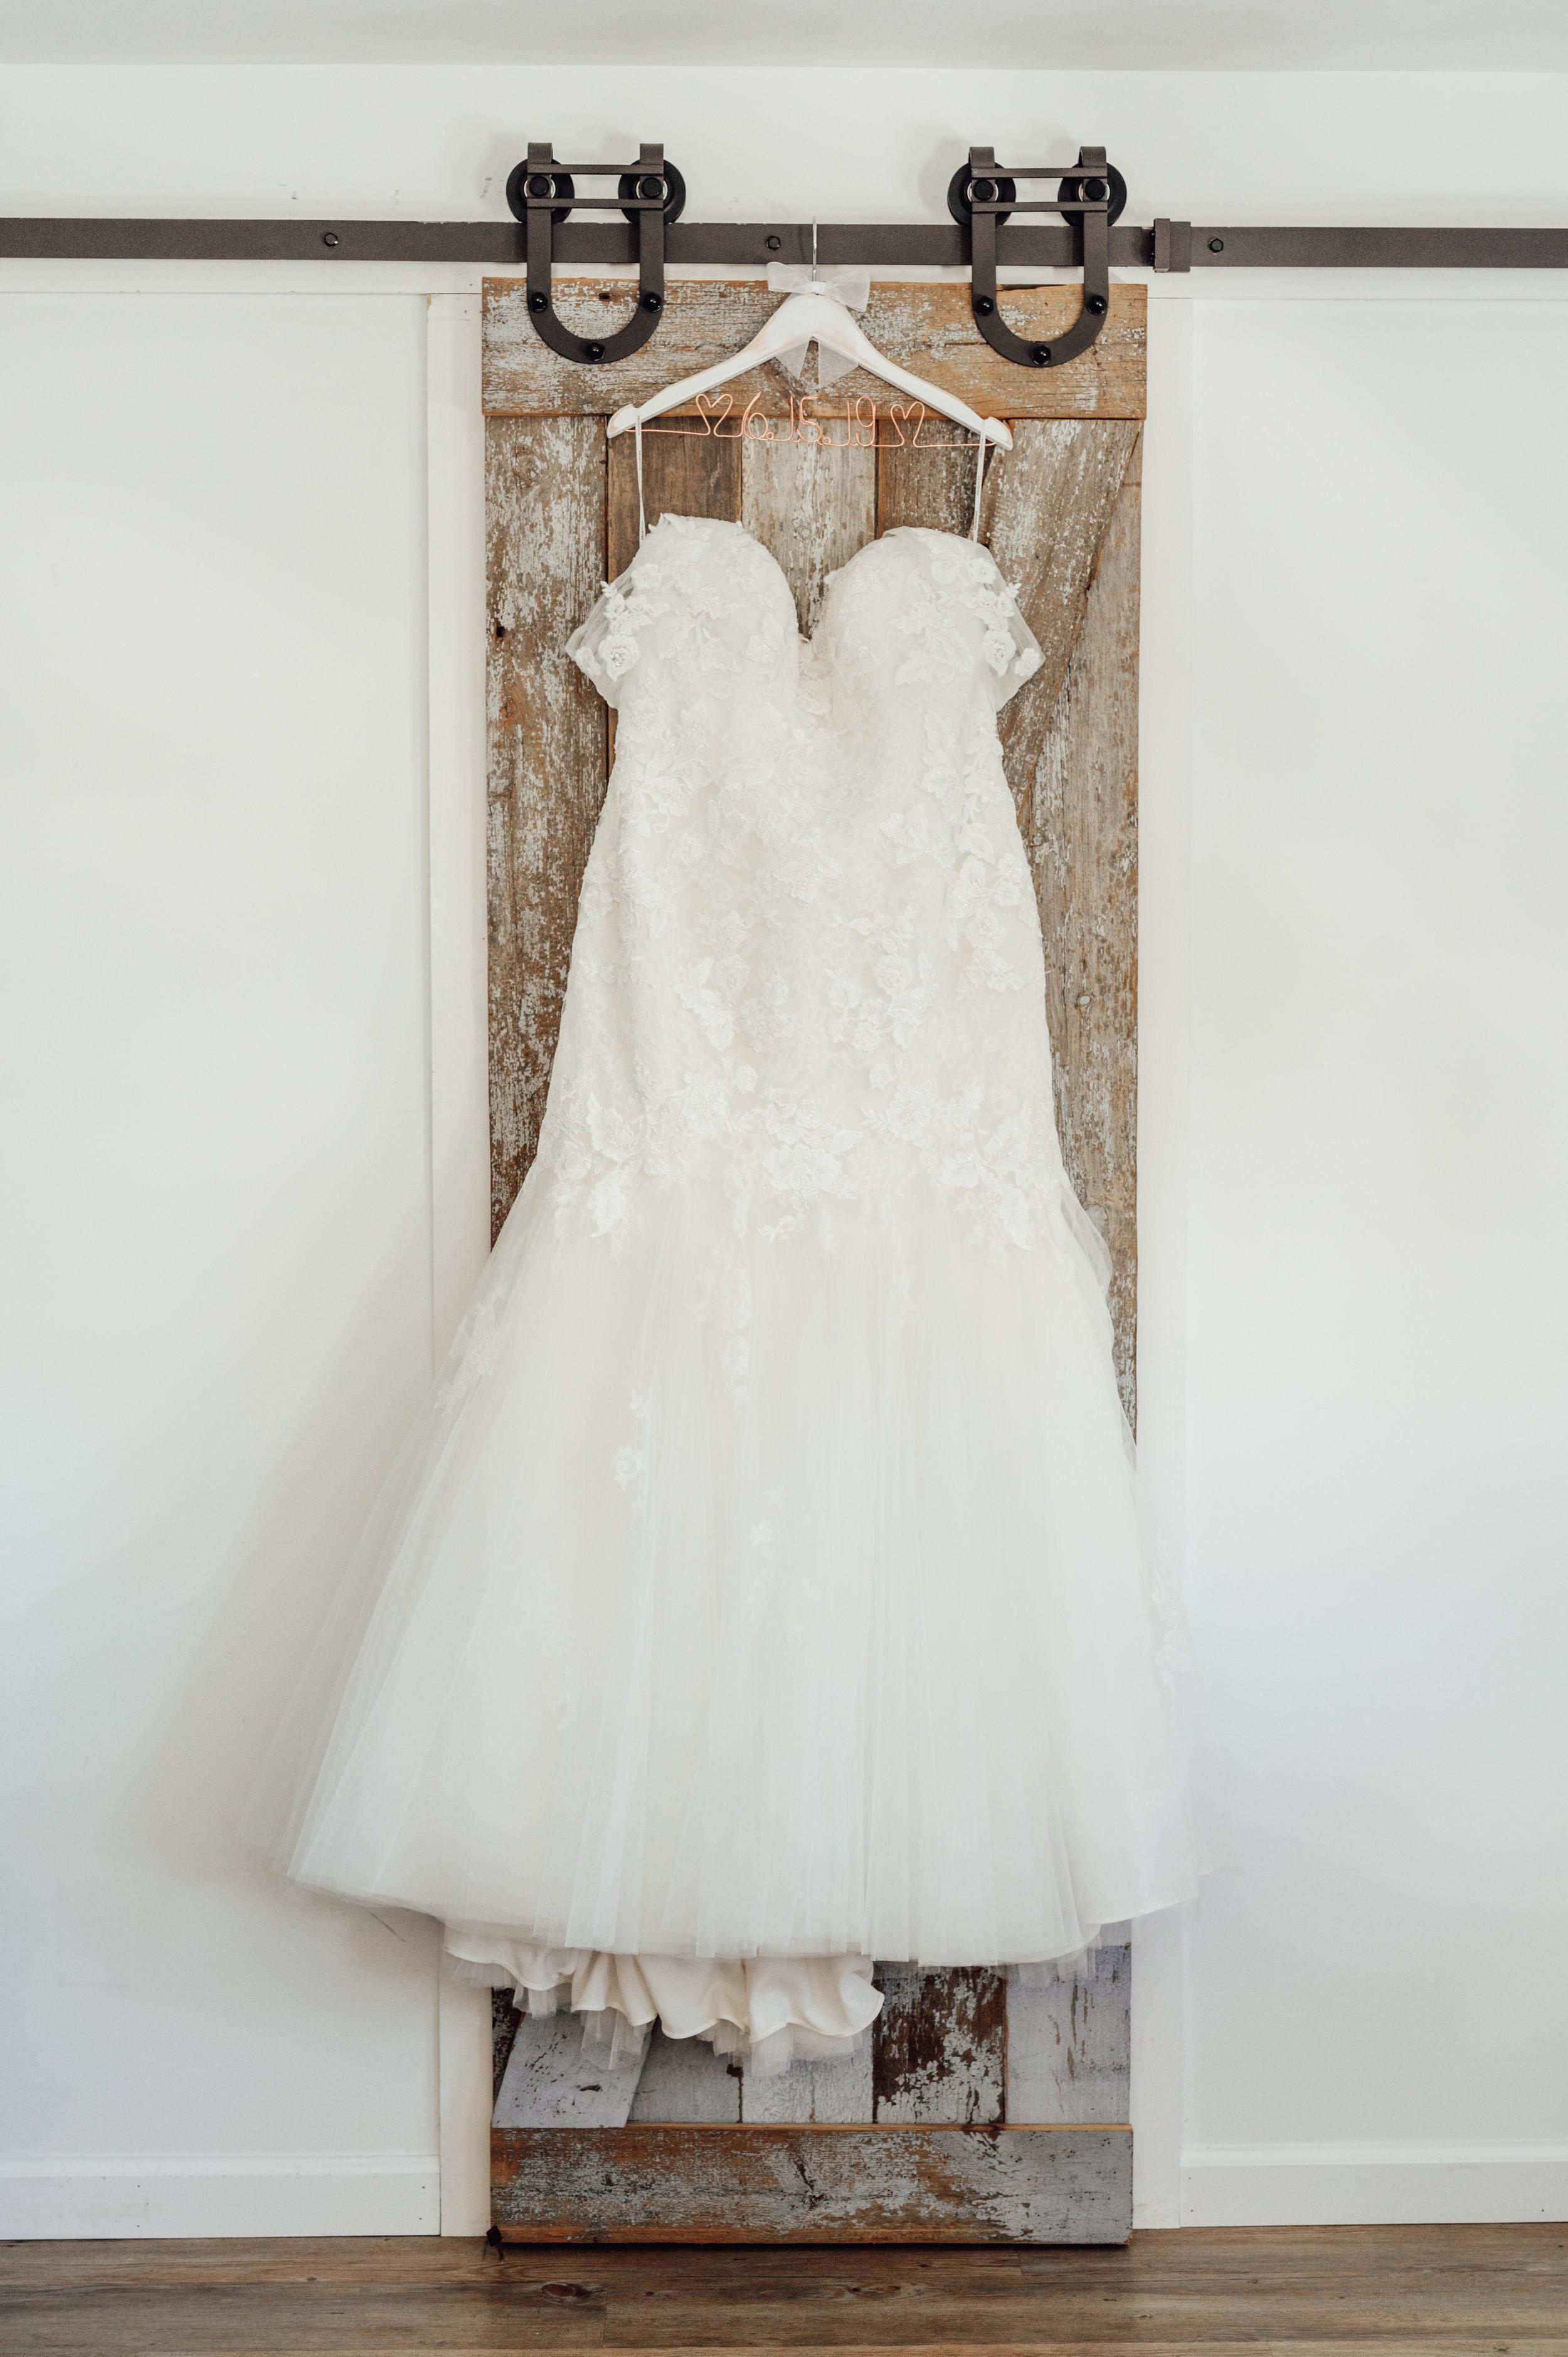 New Jersey Wedding Photographer, Felsberg Photography LBI wedding photography 1.jpg